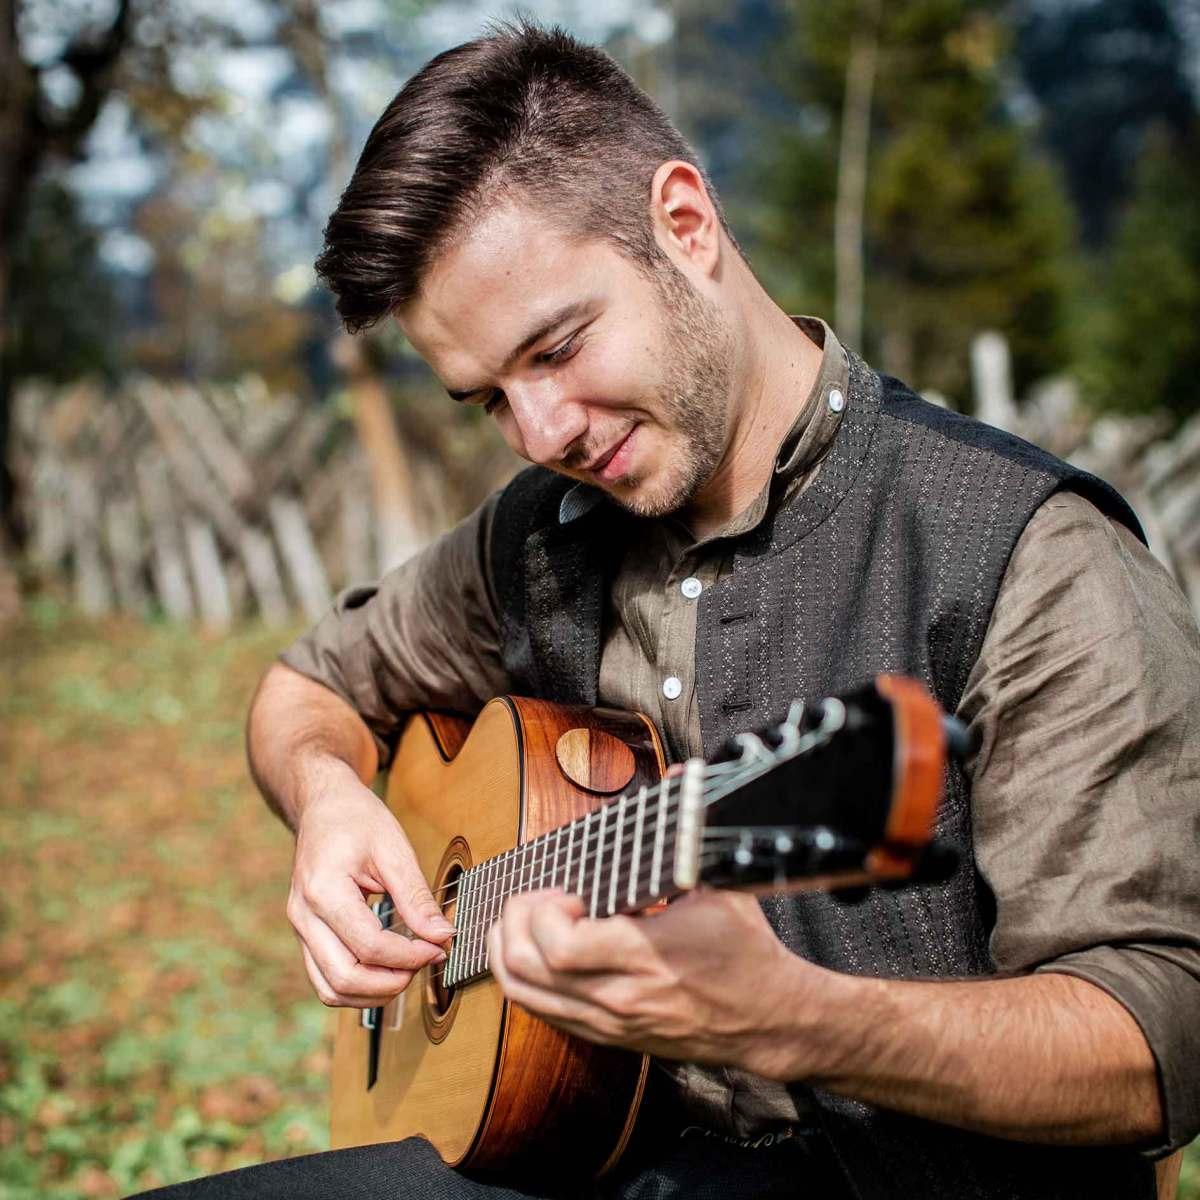 Volksmusik Gitarre Bassgänge Dominik Meißnitzer Melodiegitarre Begleitgitarre Harmonika Begleiten